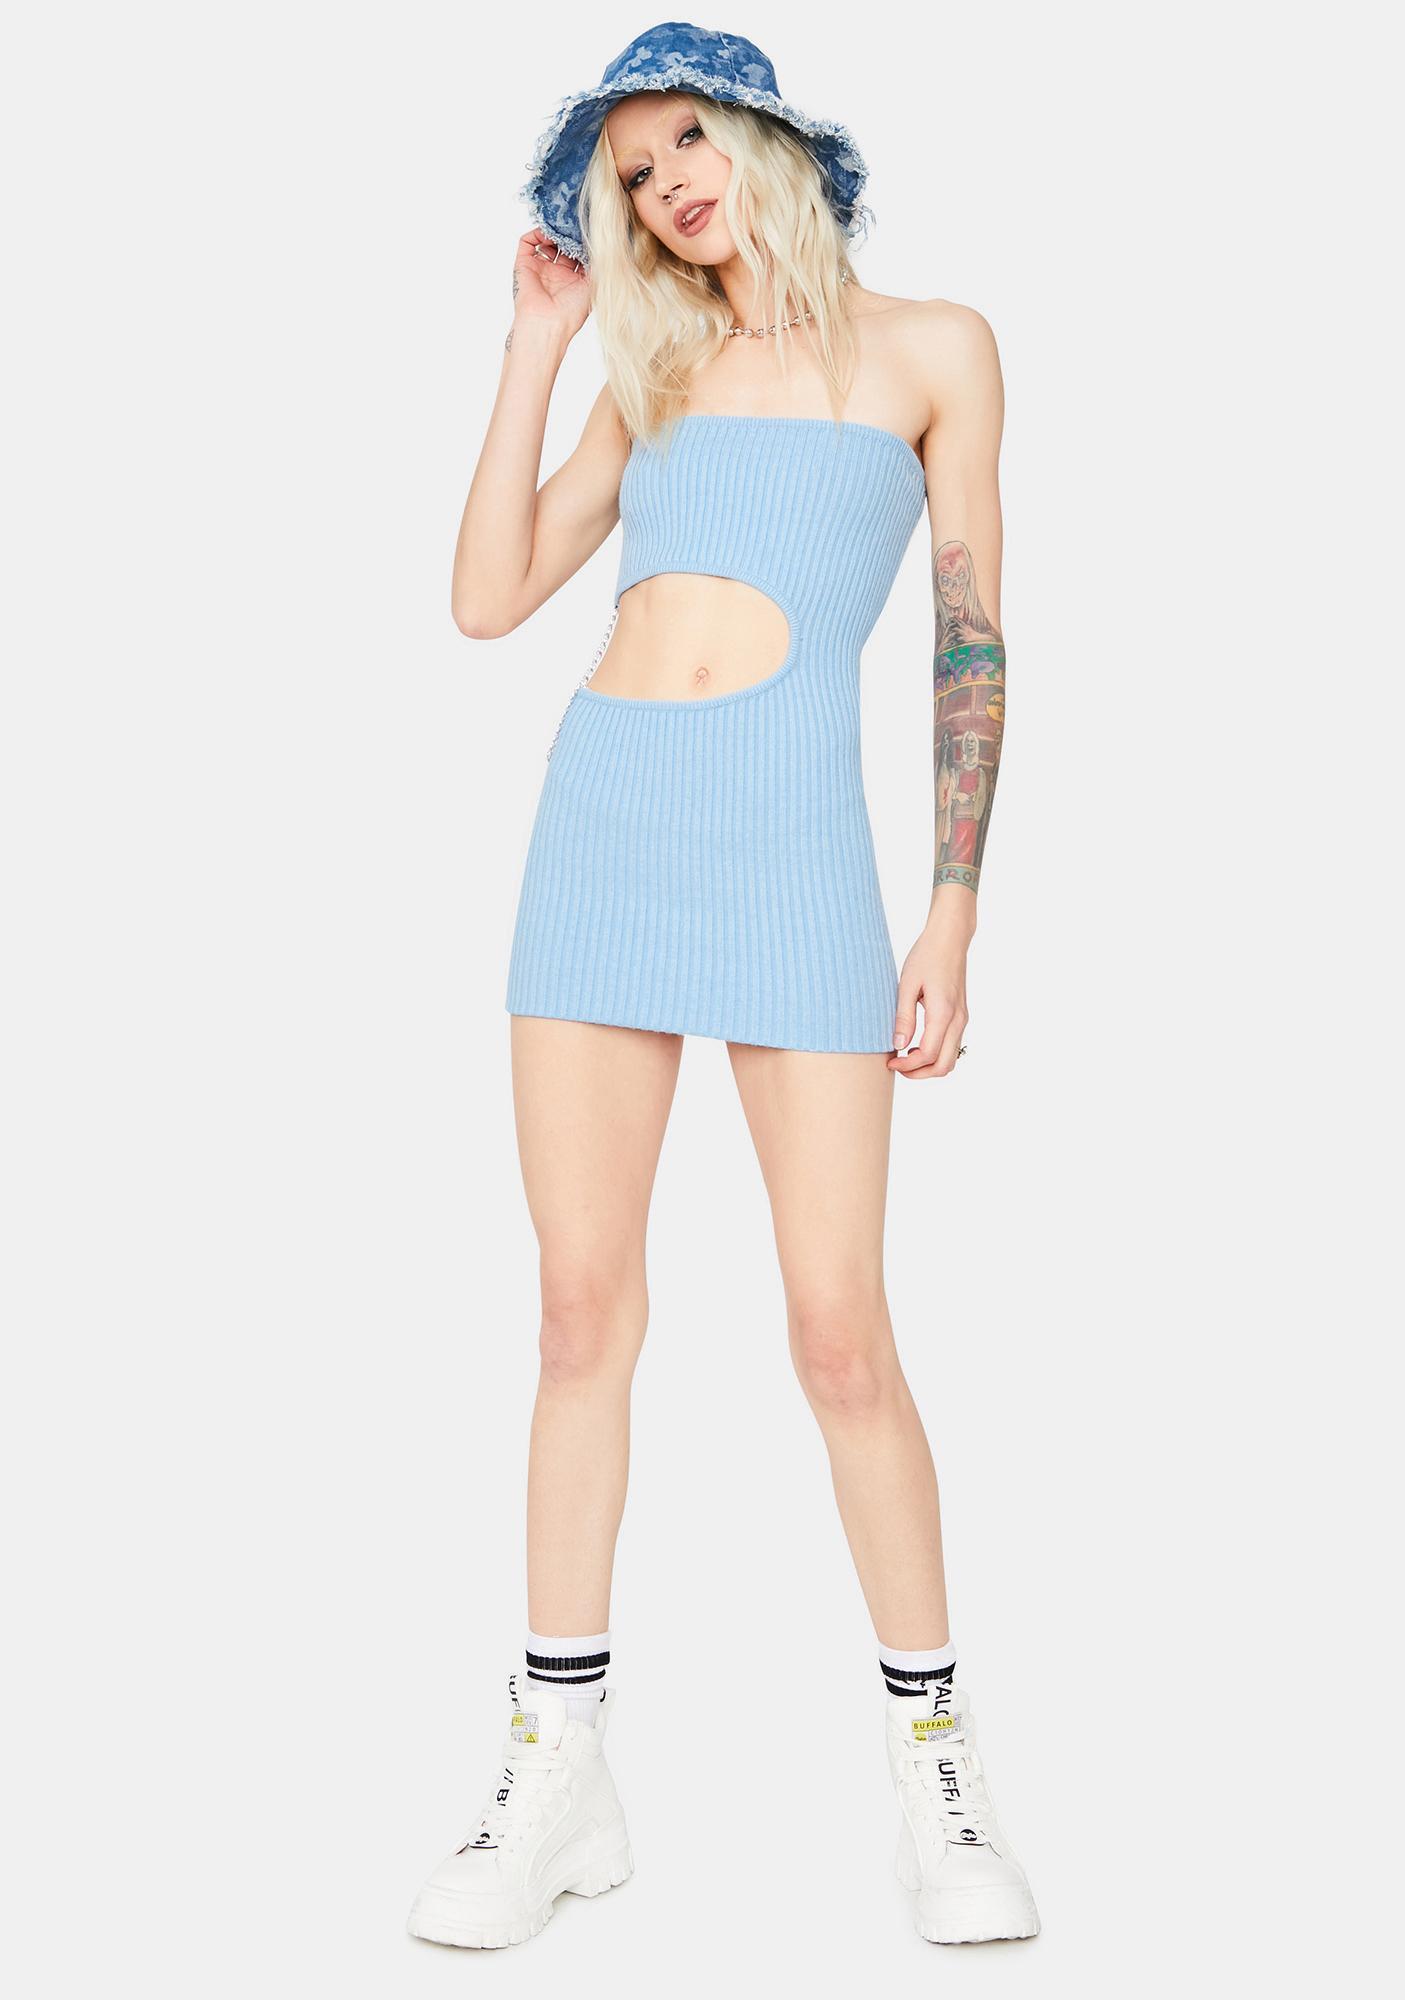 Pool Risky Behavior Cutout Tube Dress